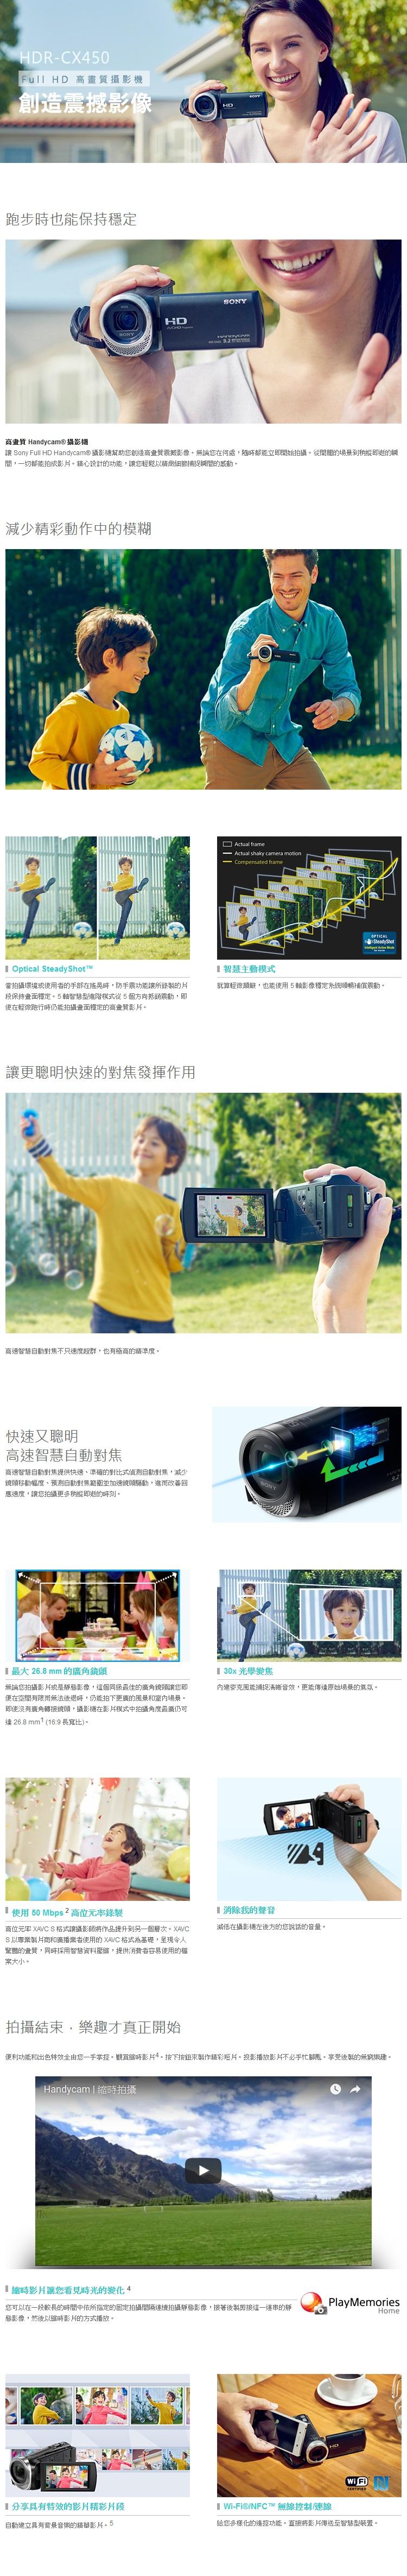 HDR-CX450-01.jpg